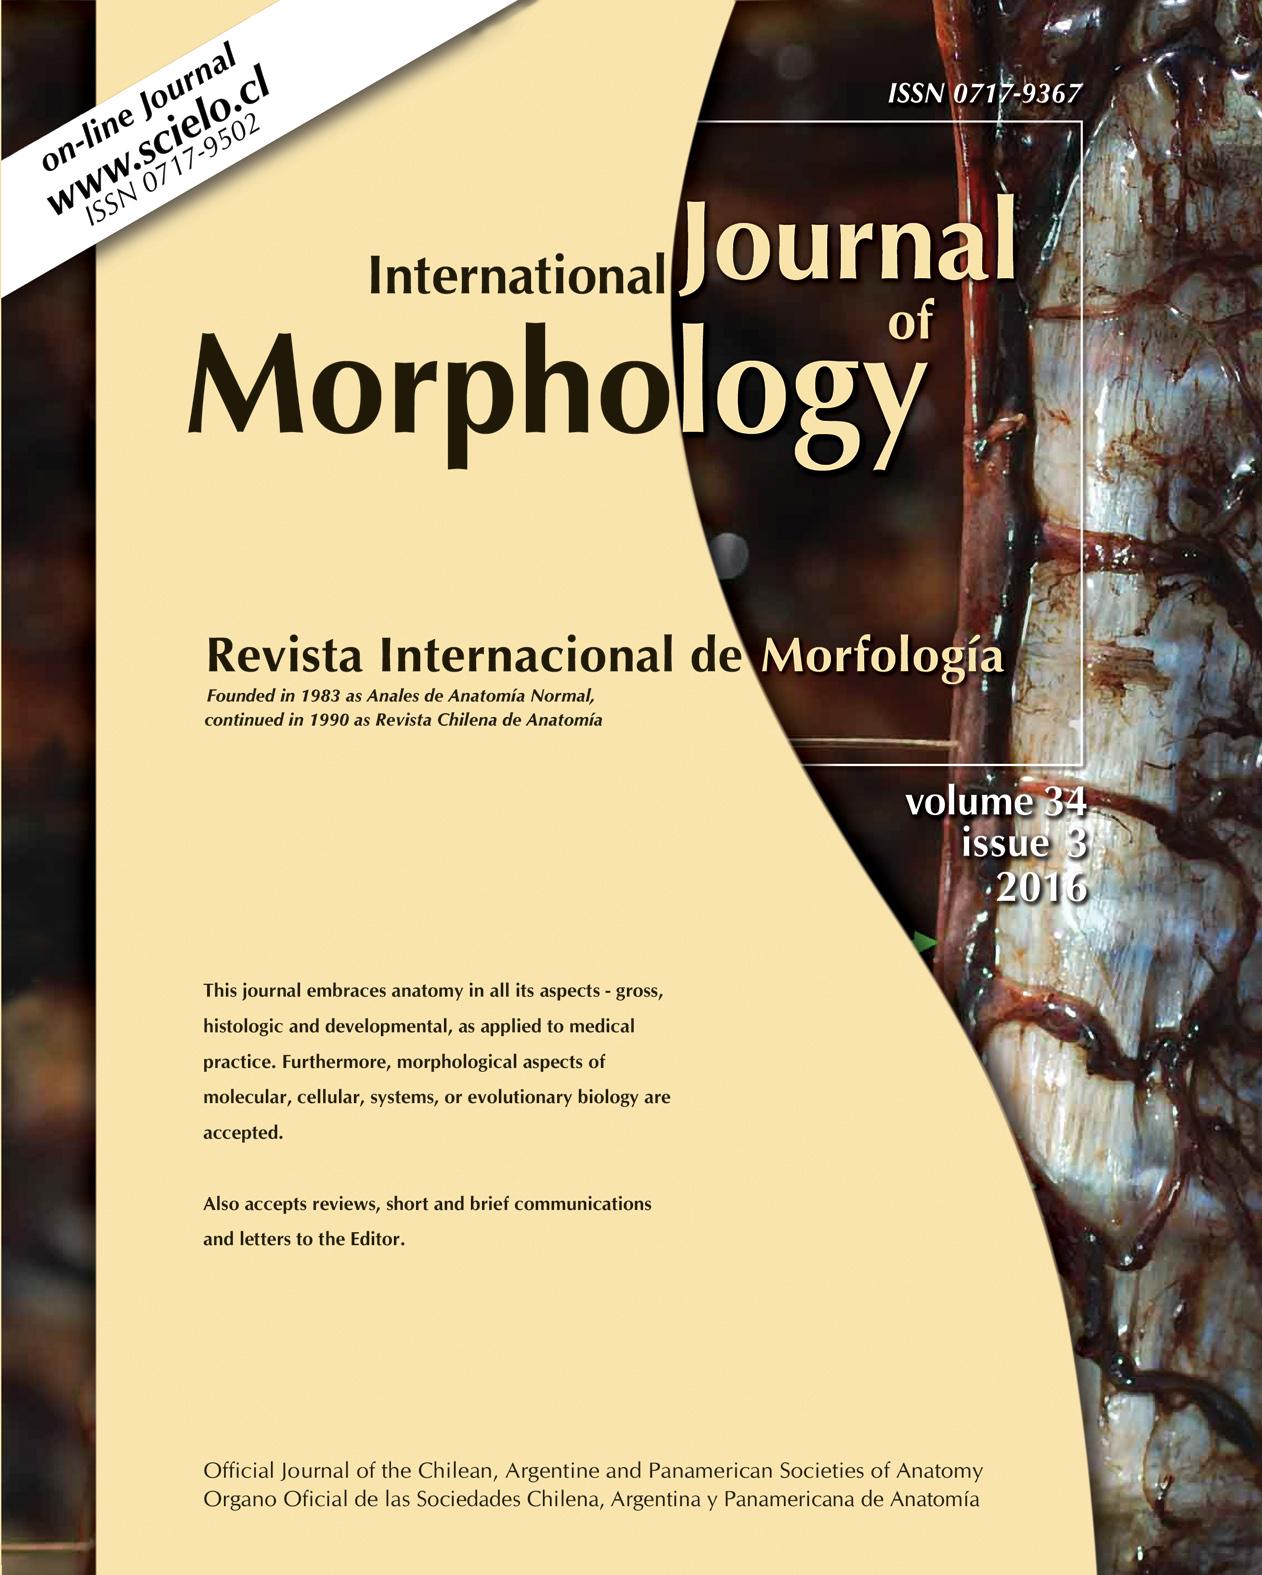 International Journal of Morphology - Otro sitio realizado con WordPress